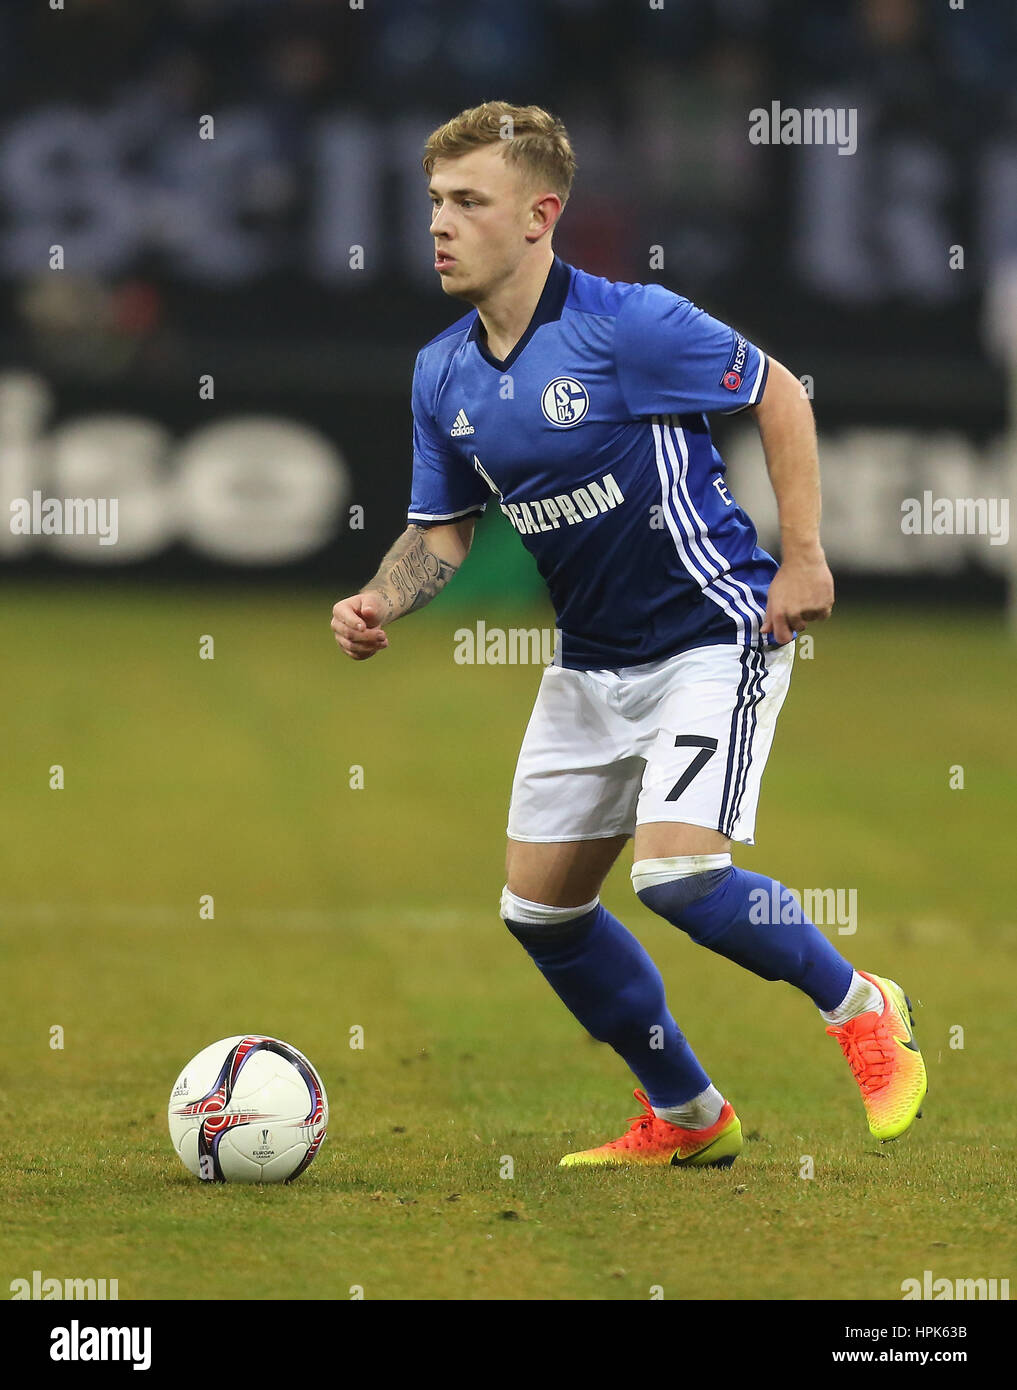 Gelsenkirchen, Germany 22.02.2017, FC Schalke 04 vs PAOK FC, Max Meyer (Schalke) controls the ball.             - Stock Image